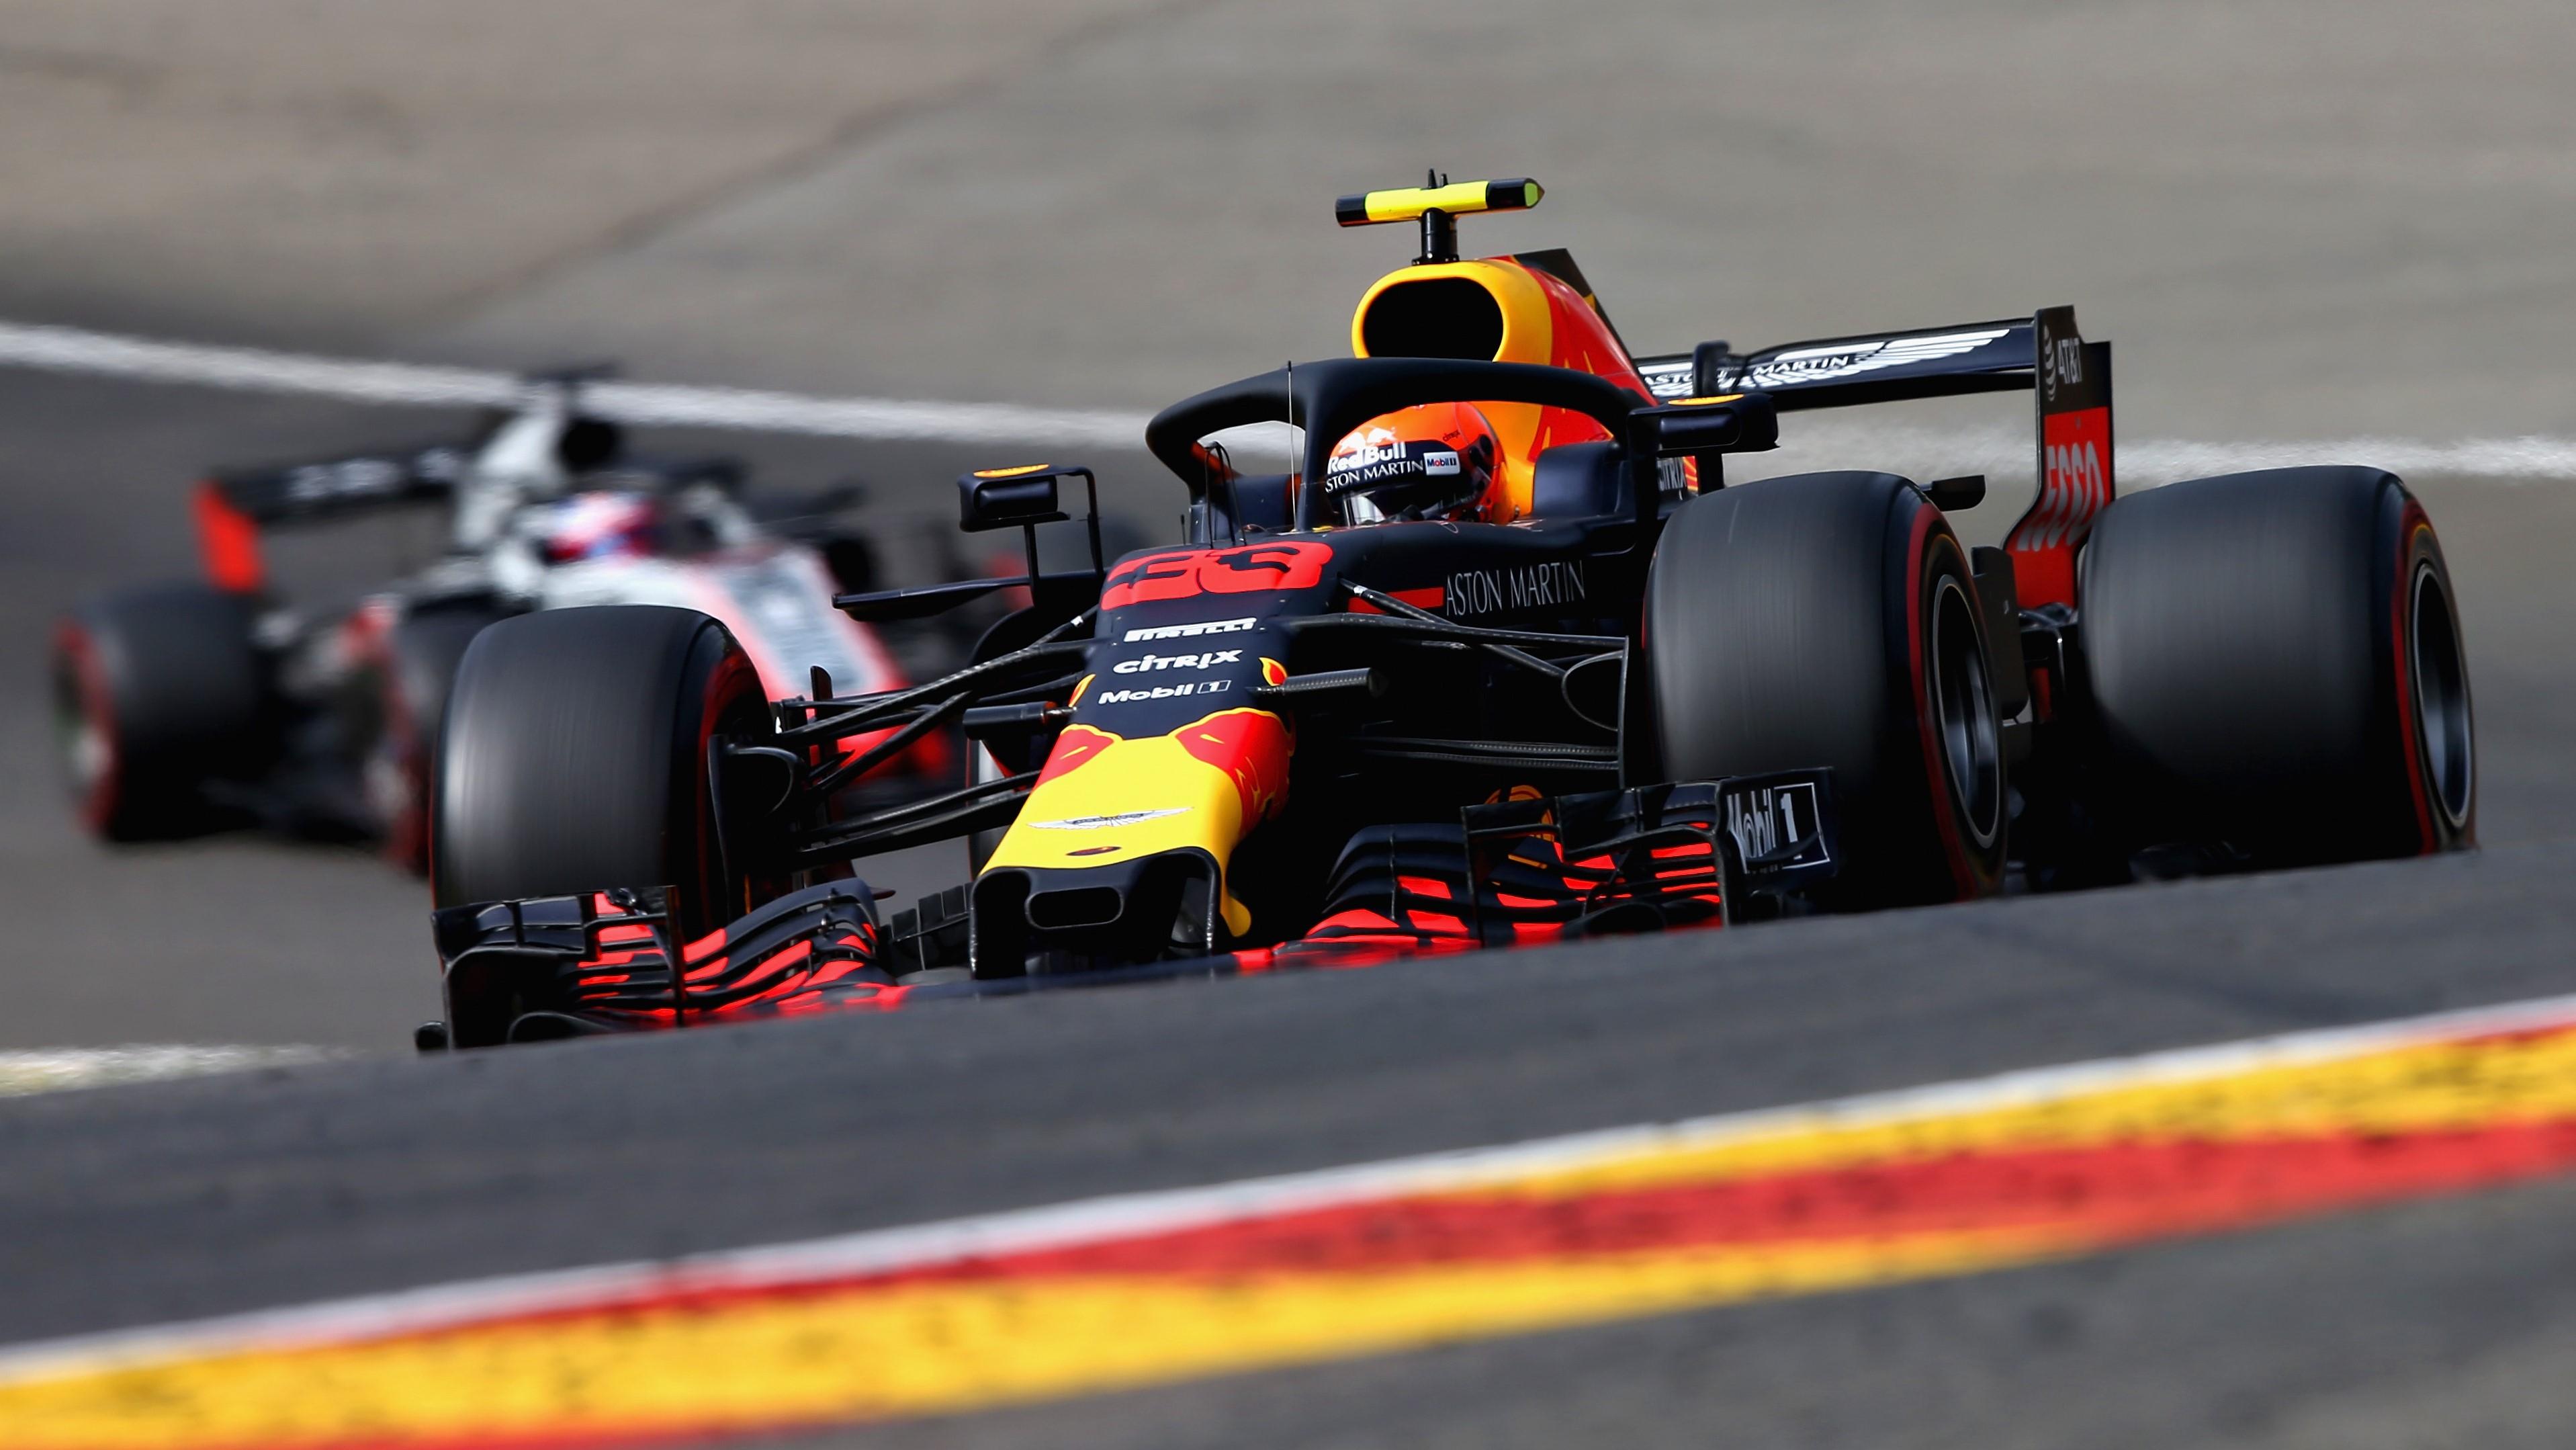 How to Live Stream the F1 2019 Belgian Grand Prix | Tom's Guide